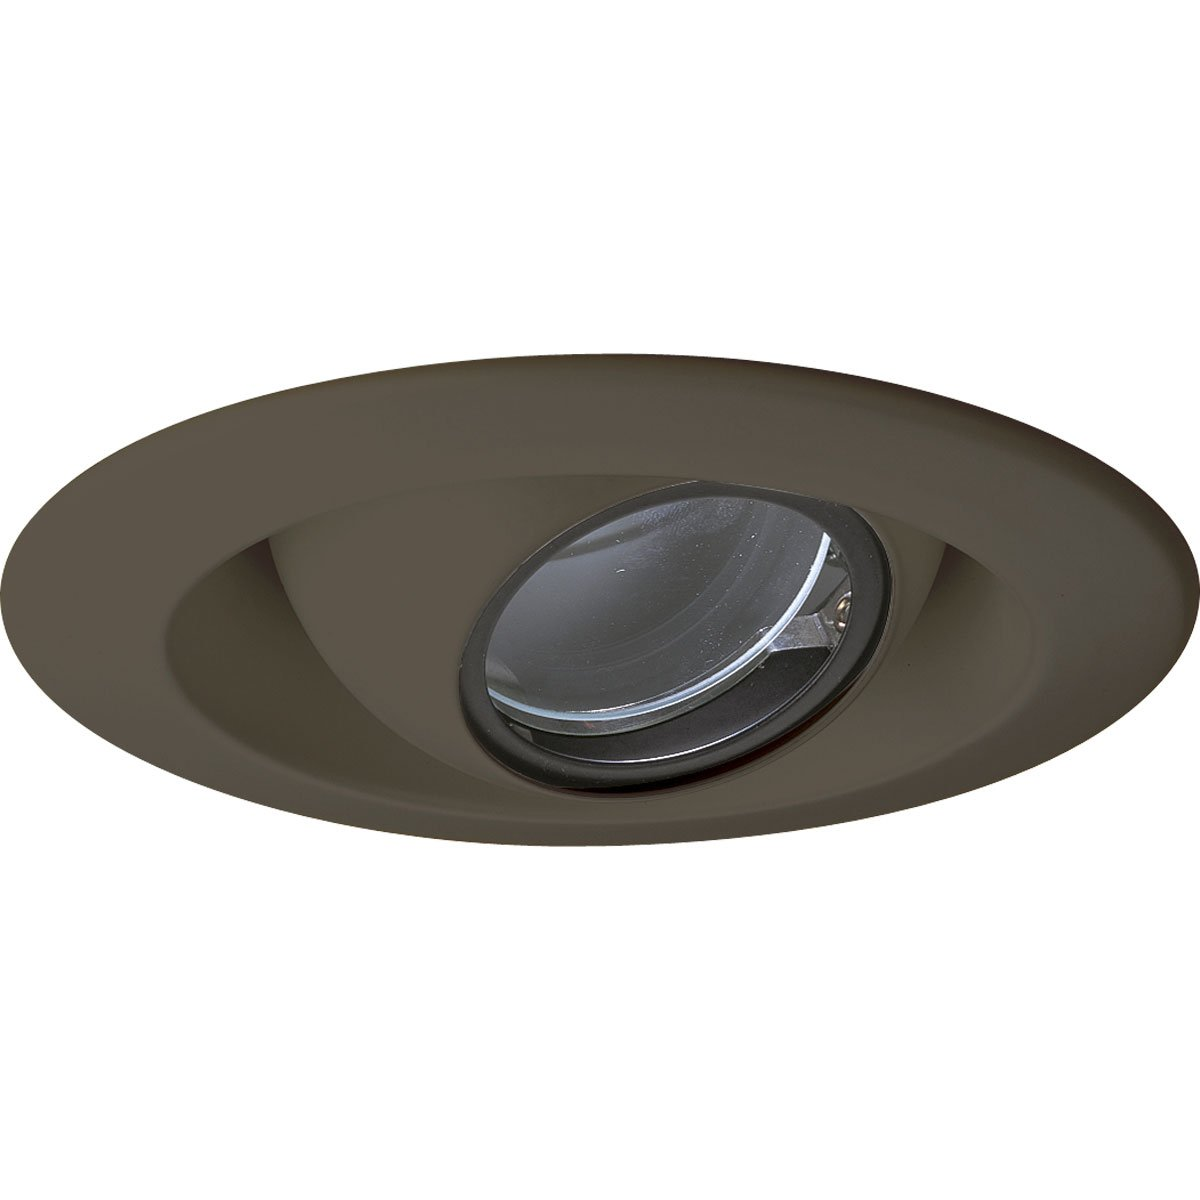 Progress Lighting P8057-20 Eyeball Trims That Have 360 Degree Positioning Lamps That Tilt 30 Degrees Maximum with 5-Inch Outside Diameter, Antique Bronze